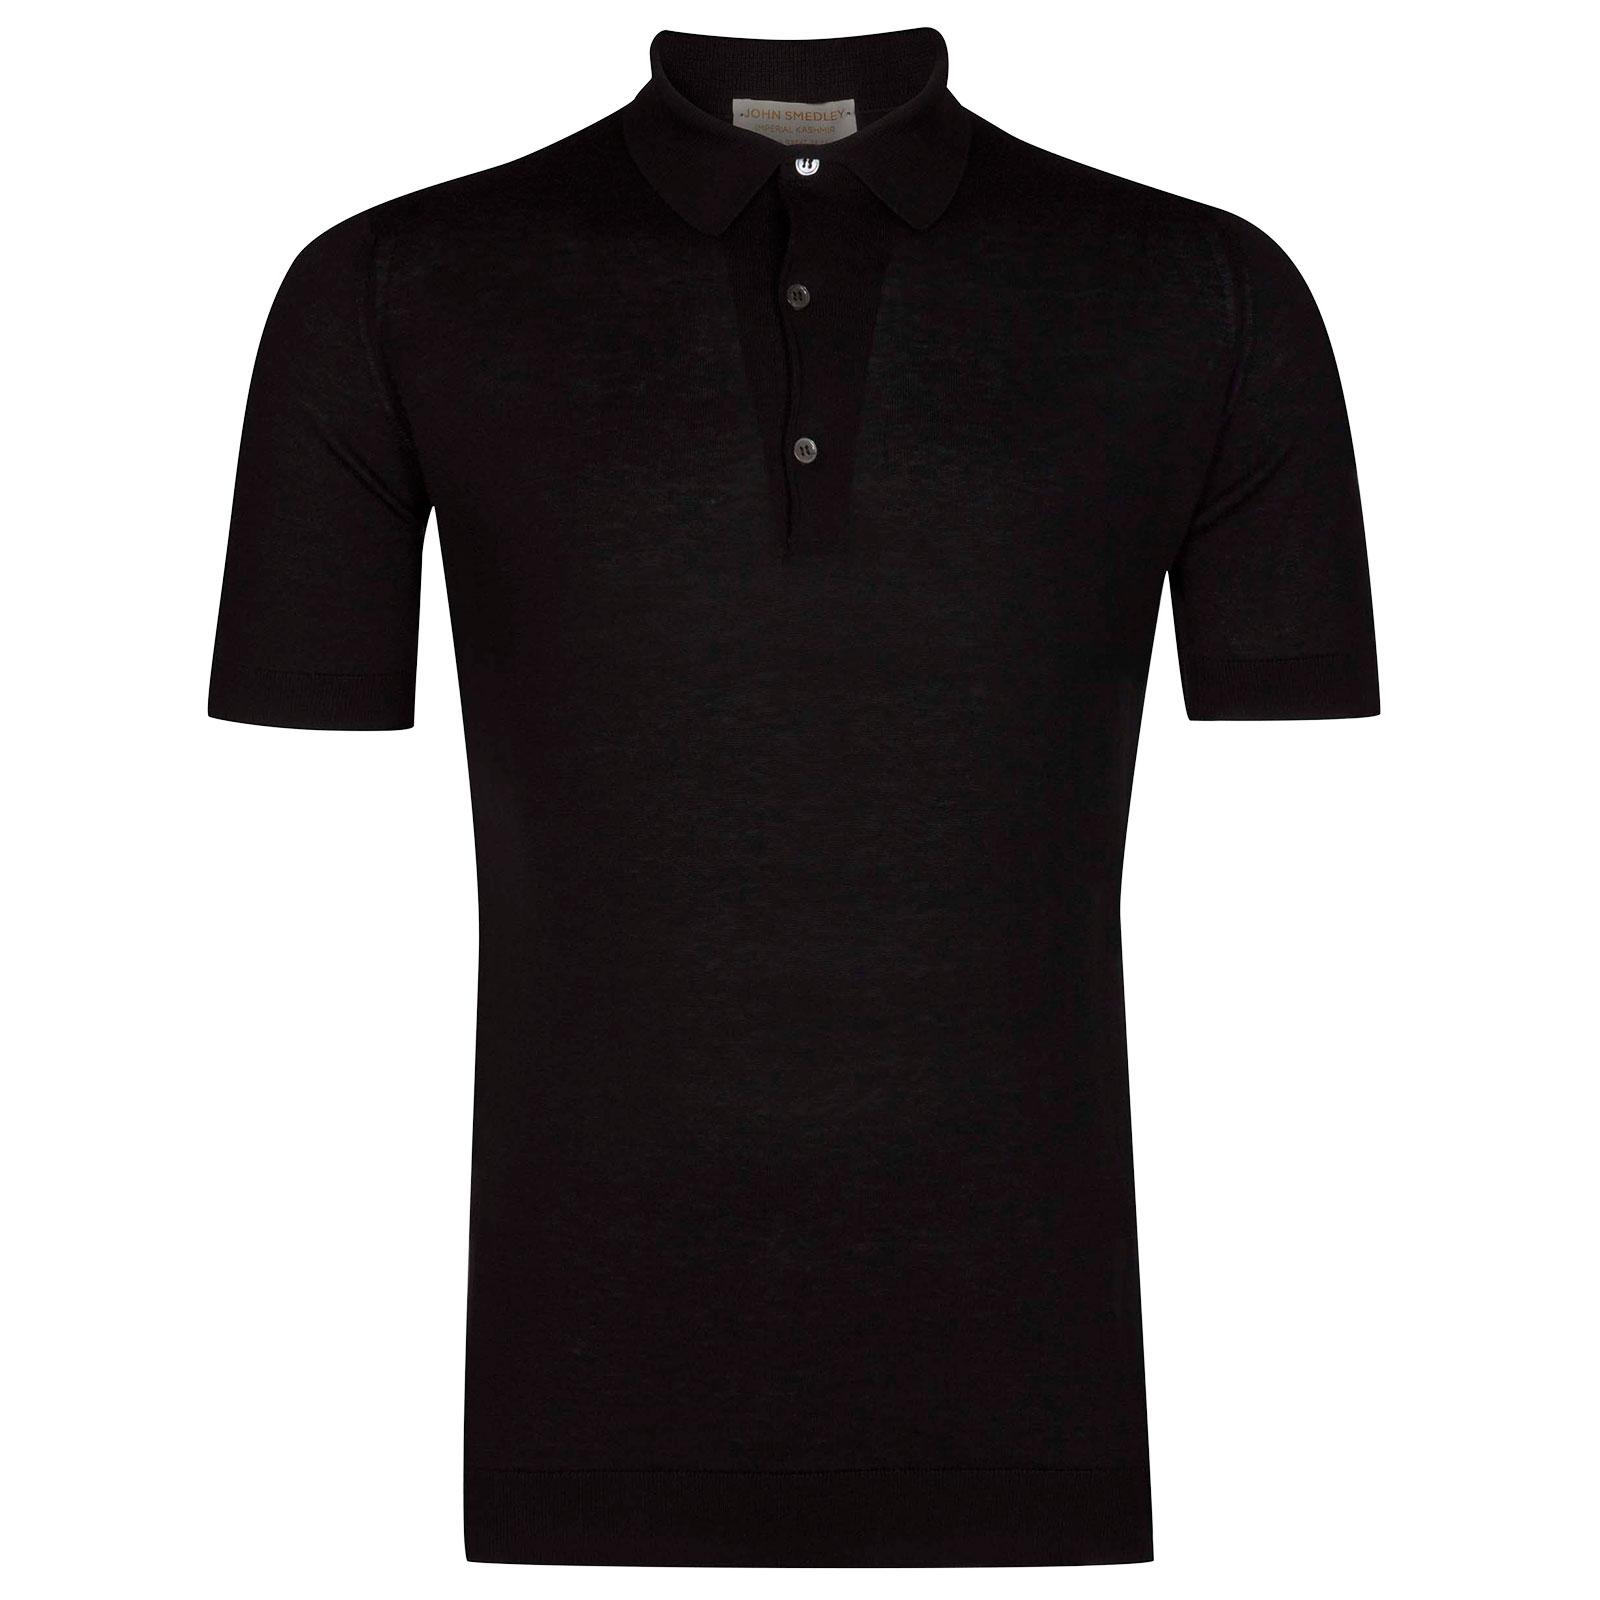 John Smedley Haddon in Black Shirt-XLG